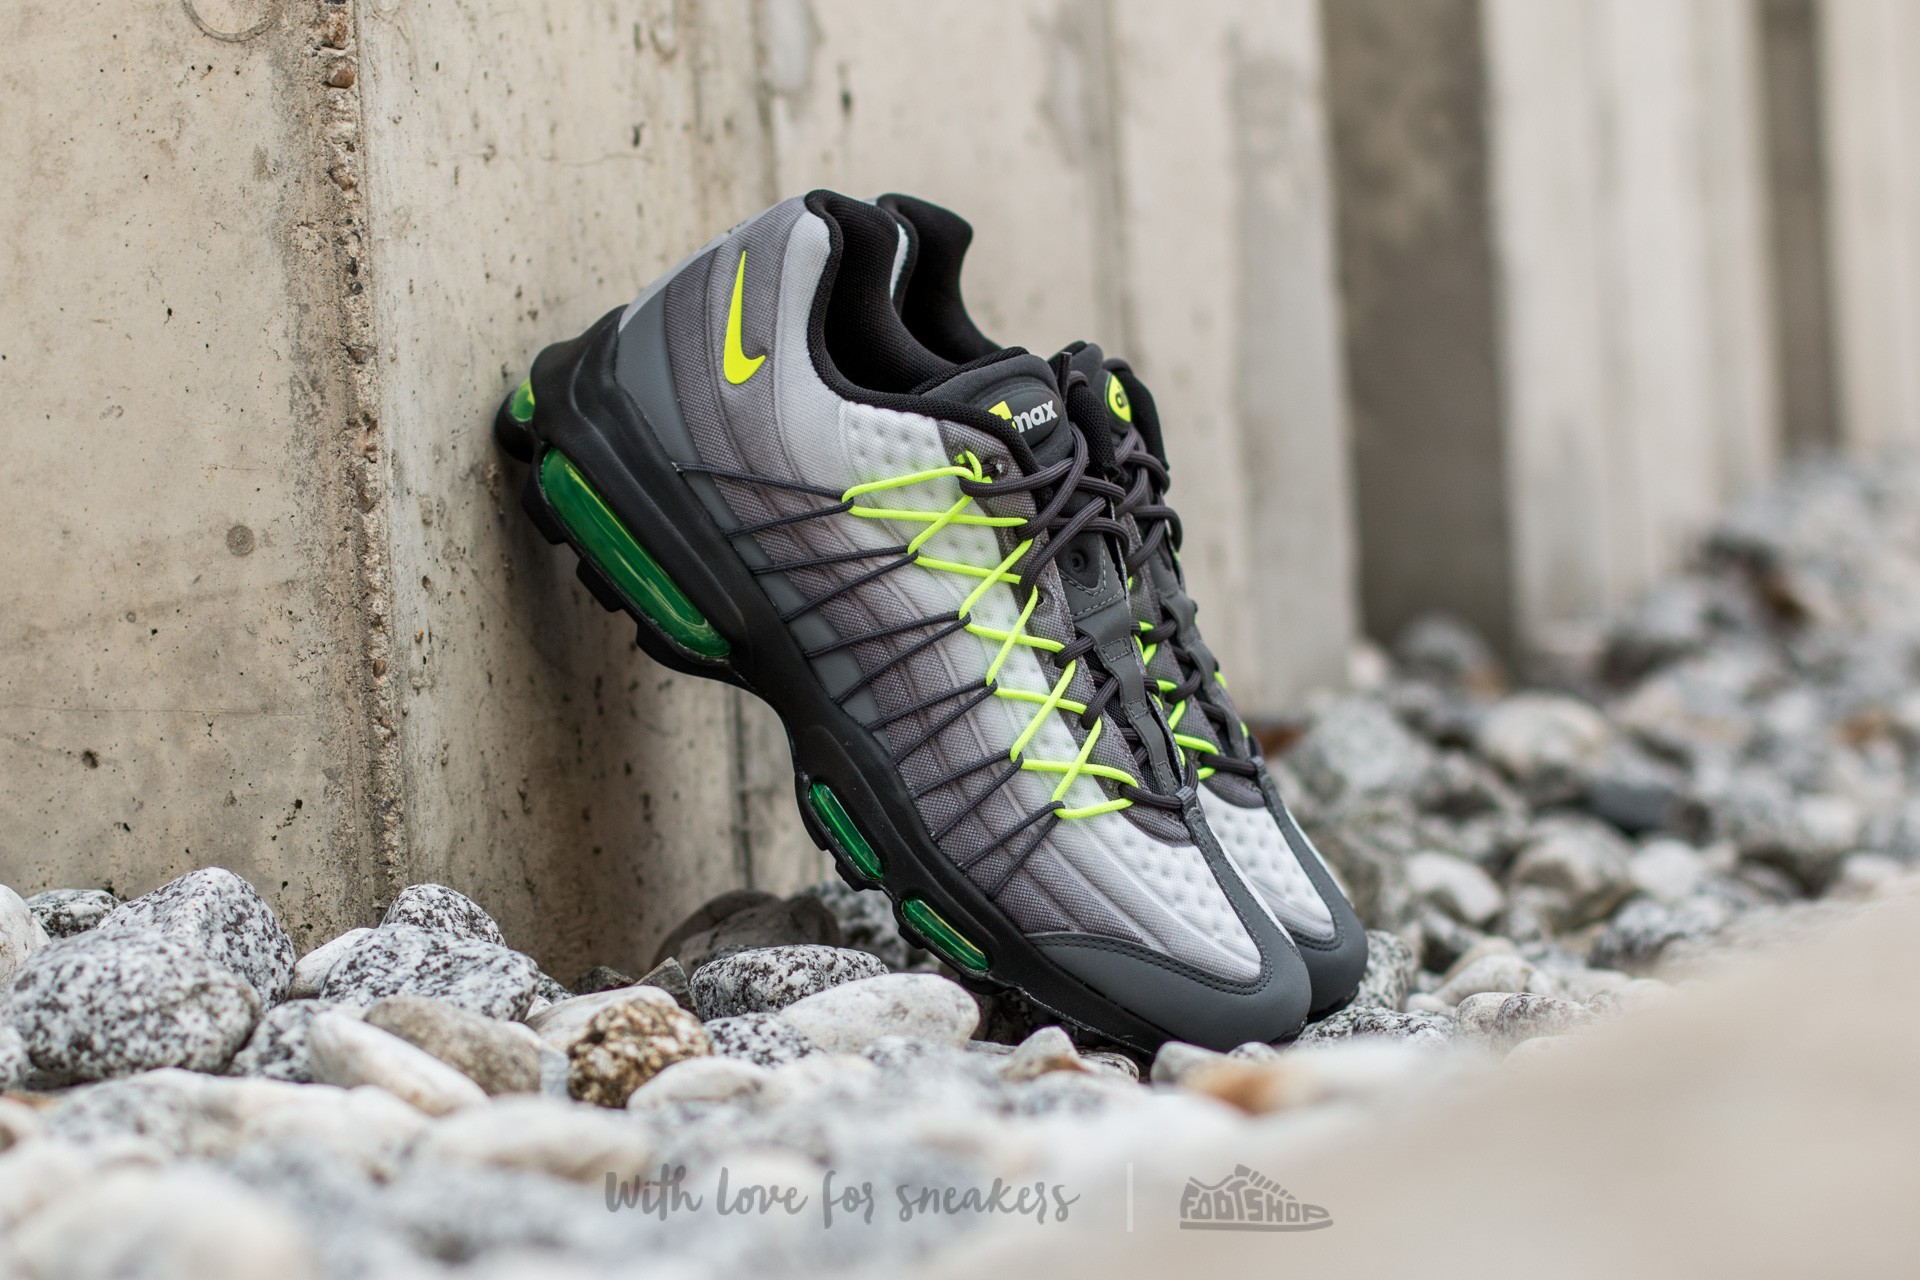 0a1f0c4faabc Nike Air Max 95 Ultra SE Dark Grey  Volt-Anthracite-Cool Grey ...